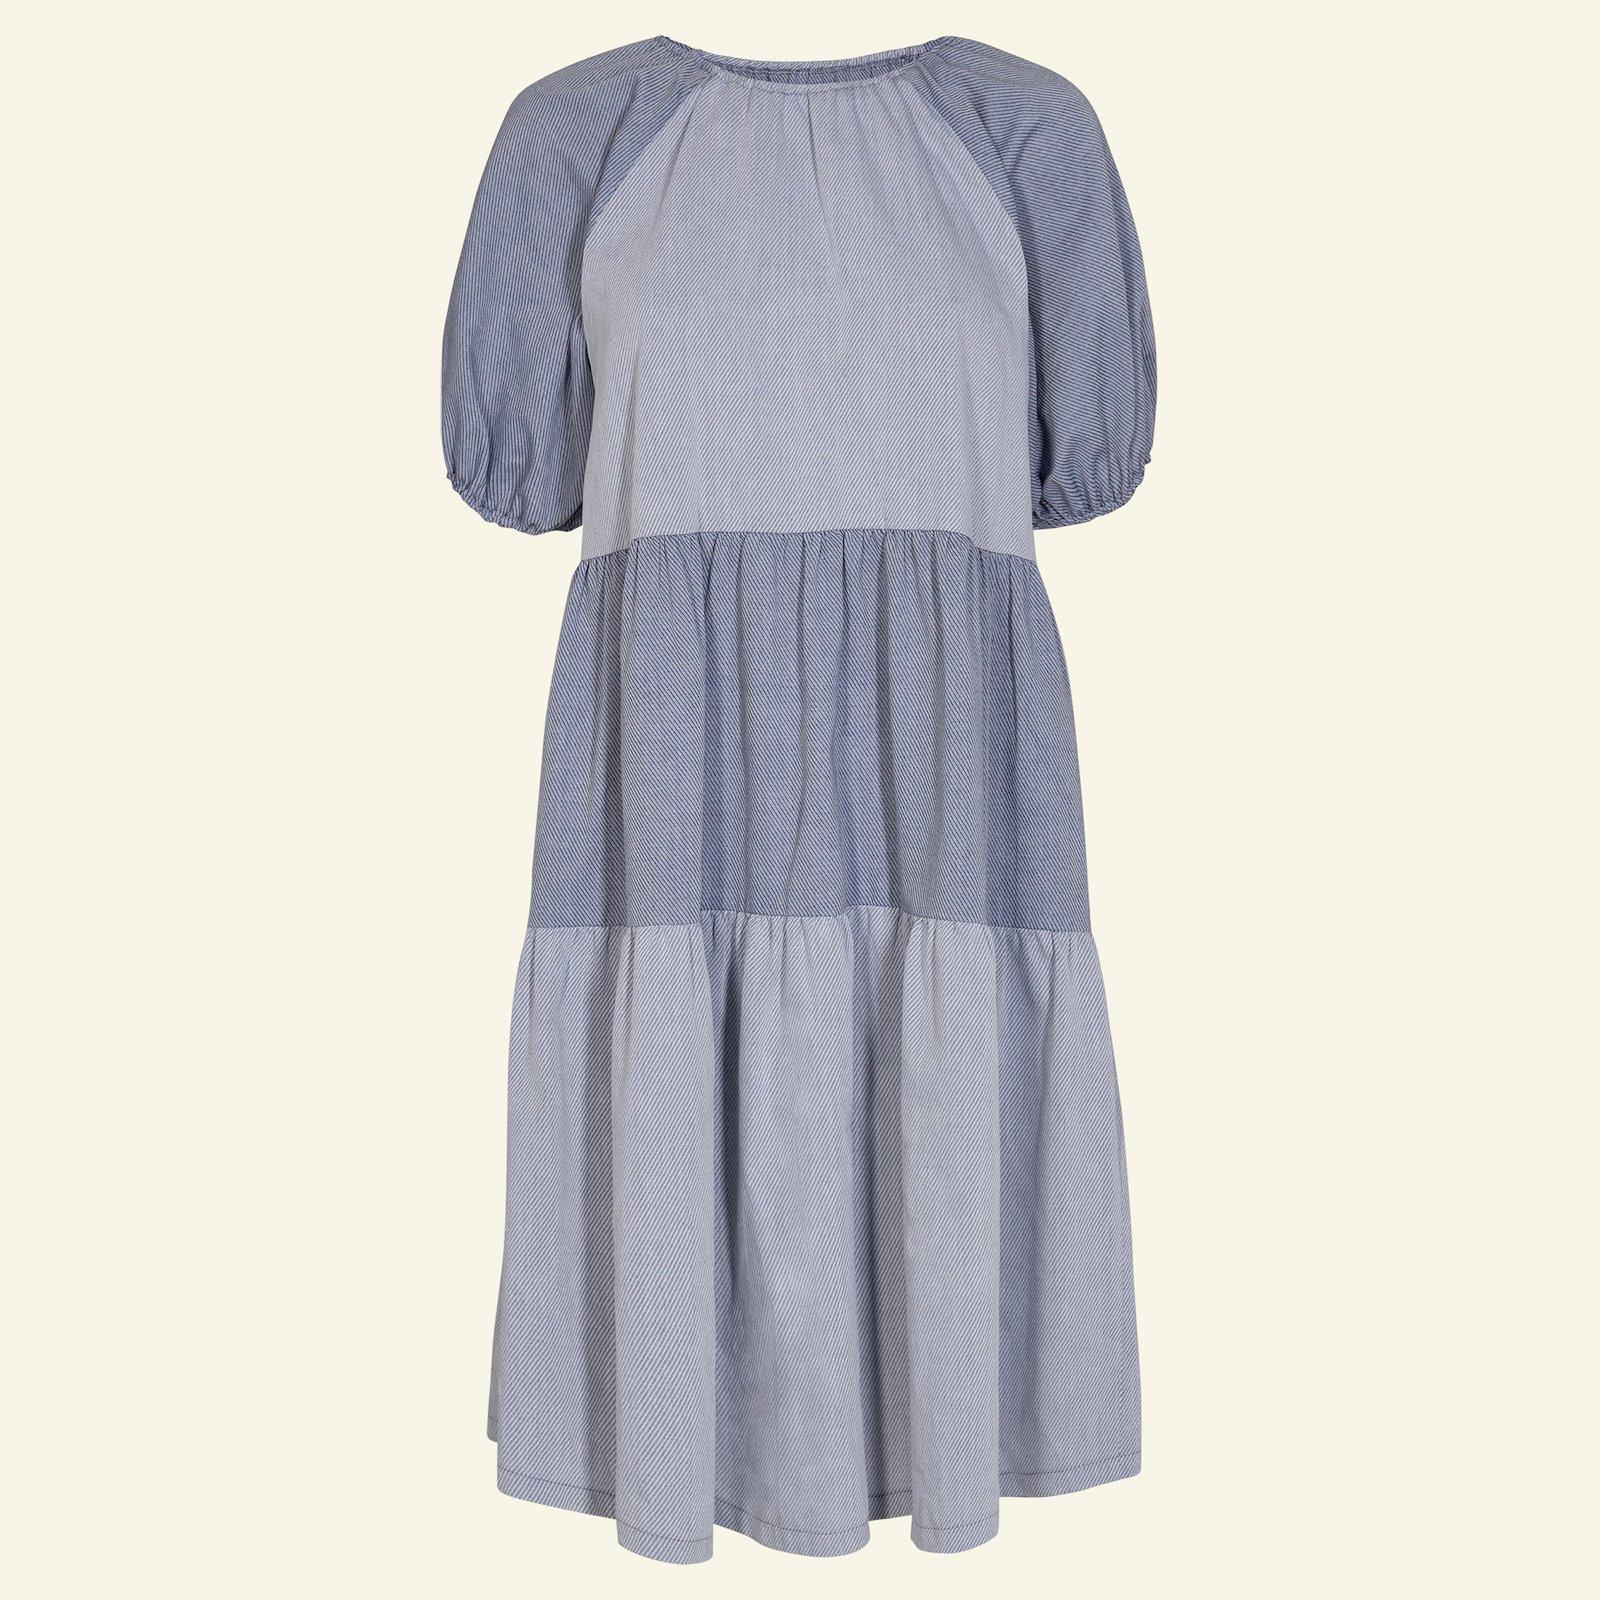 Babydoll dress p23168_501860_sskit